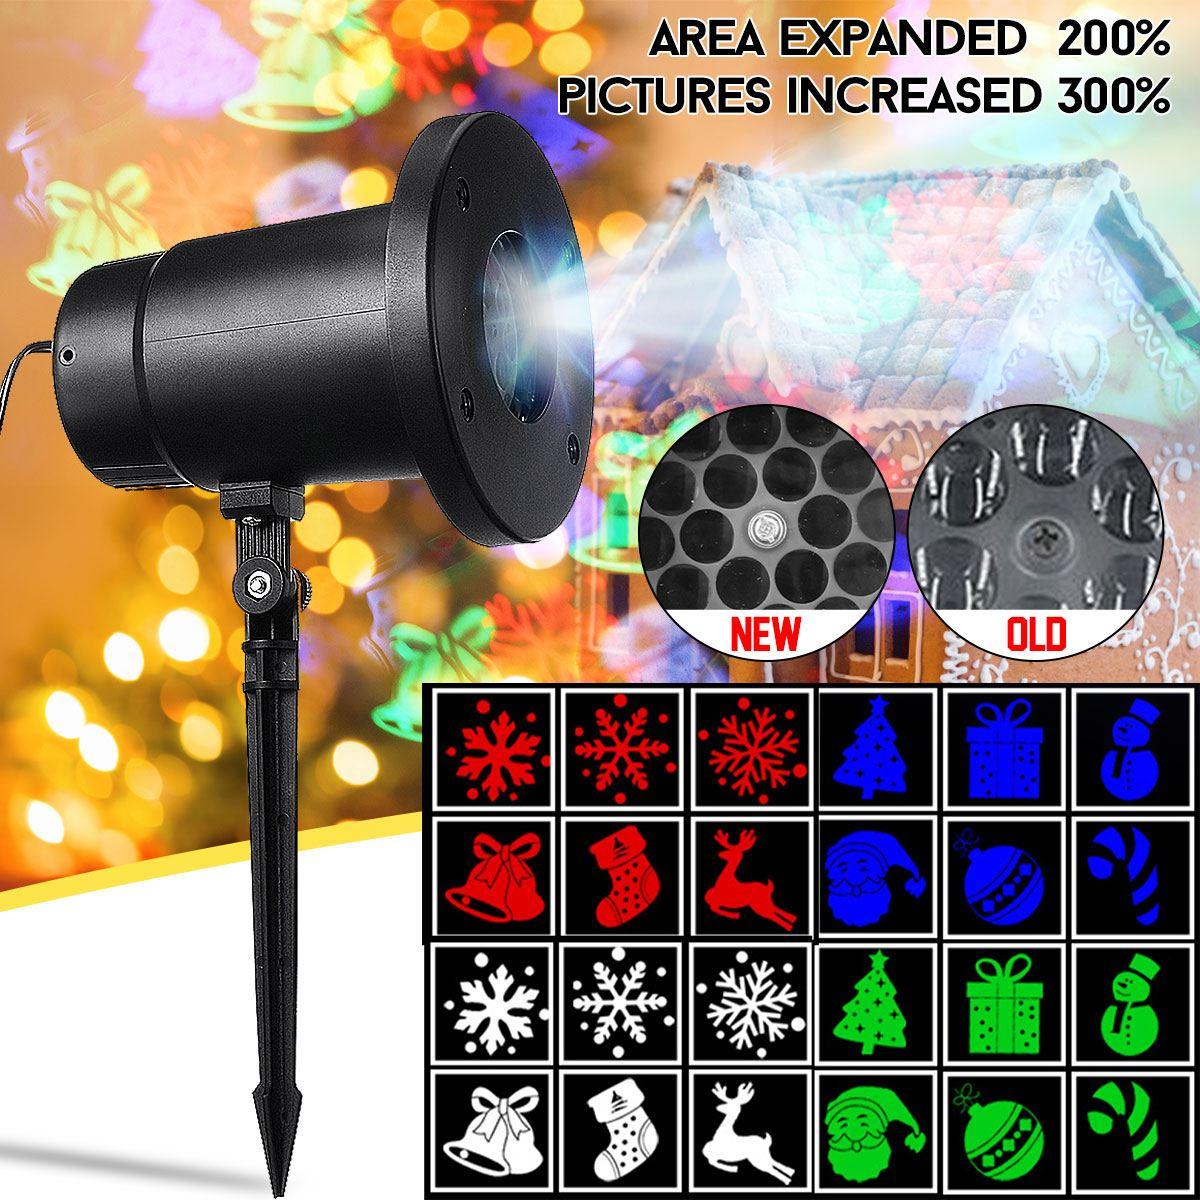 Christmas Projector Lamp Outdoor Garden Lawn  Light Snowflake Santa Decor Landscape Light Black Card Projector Lamp